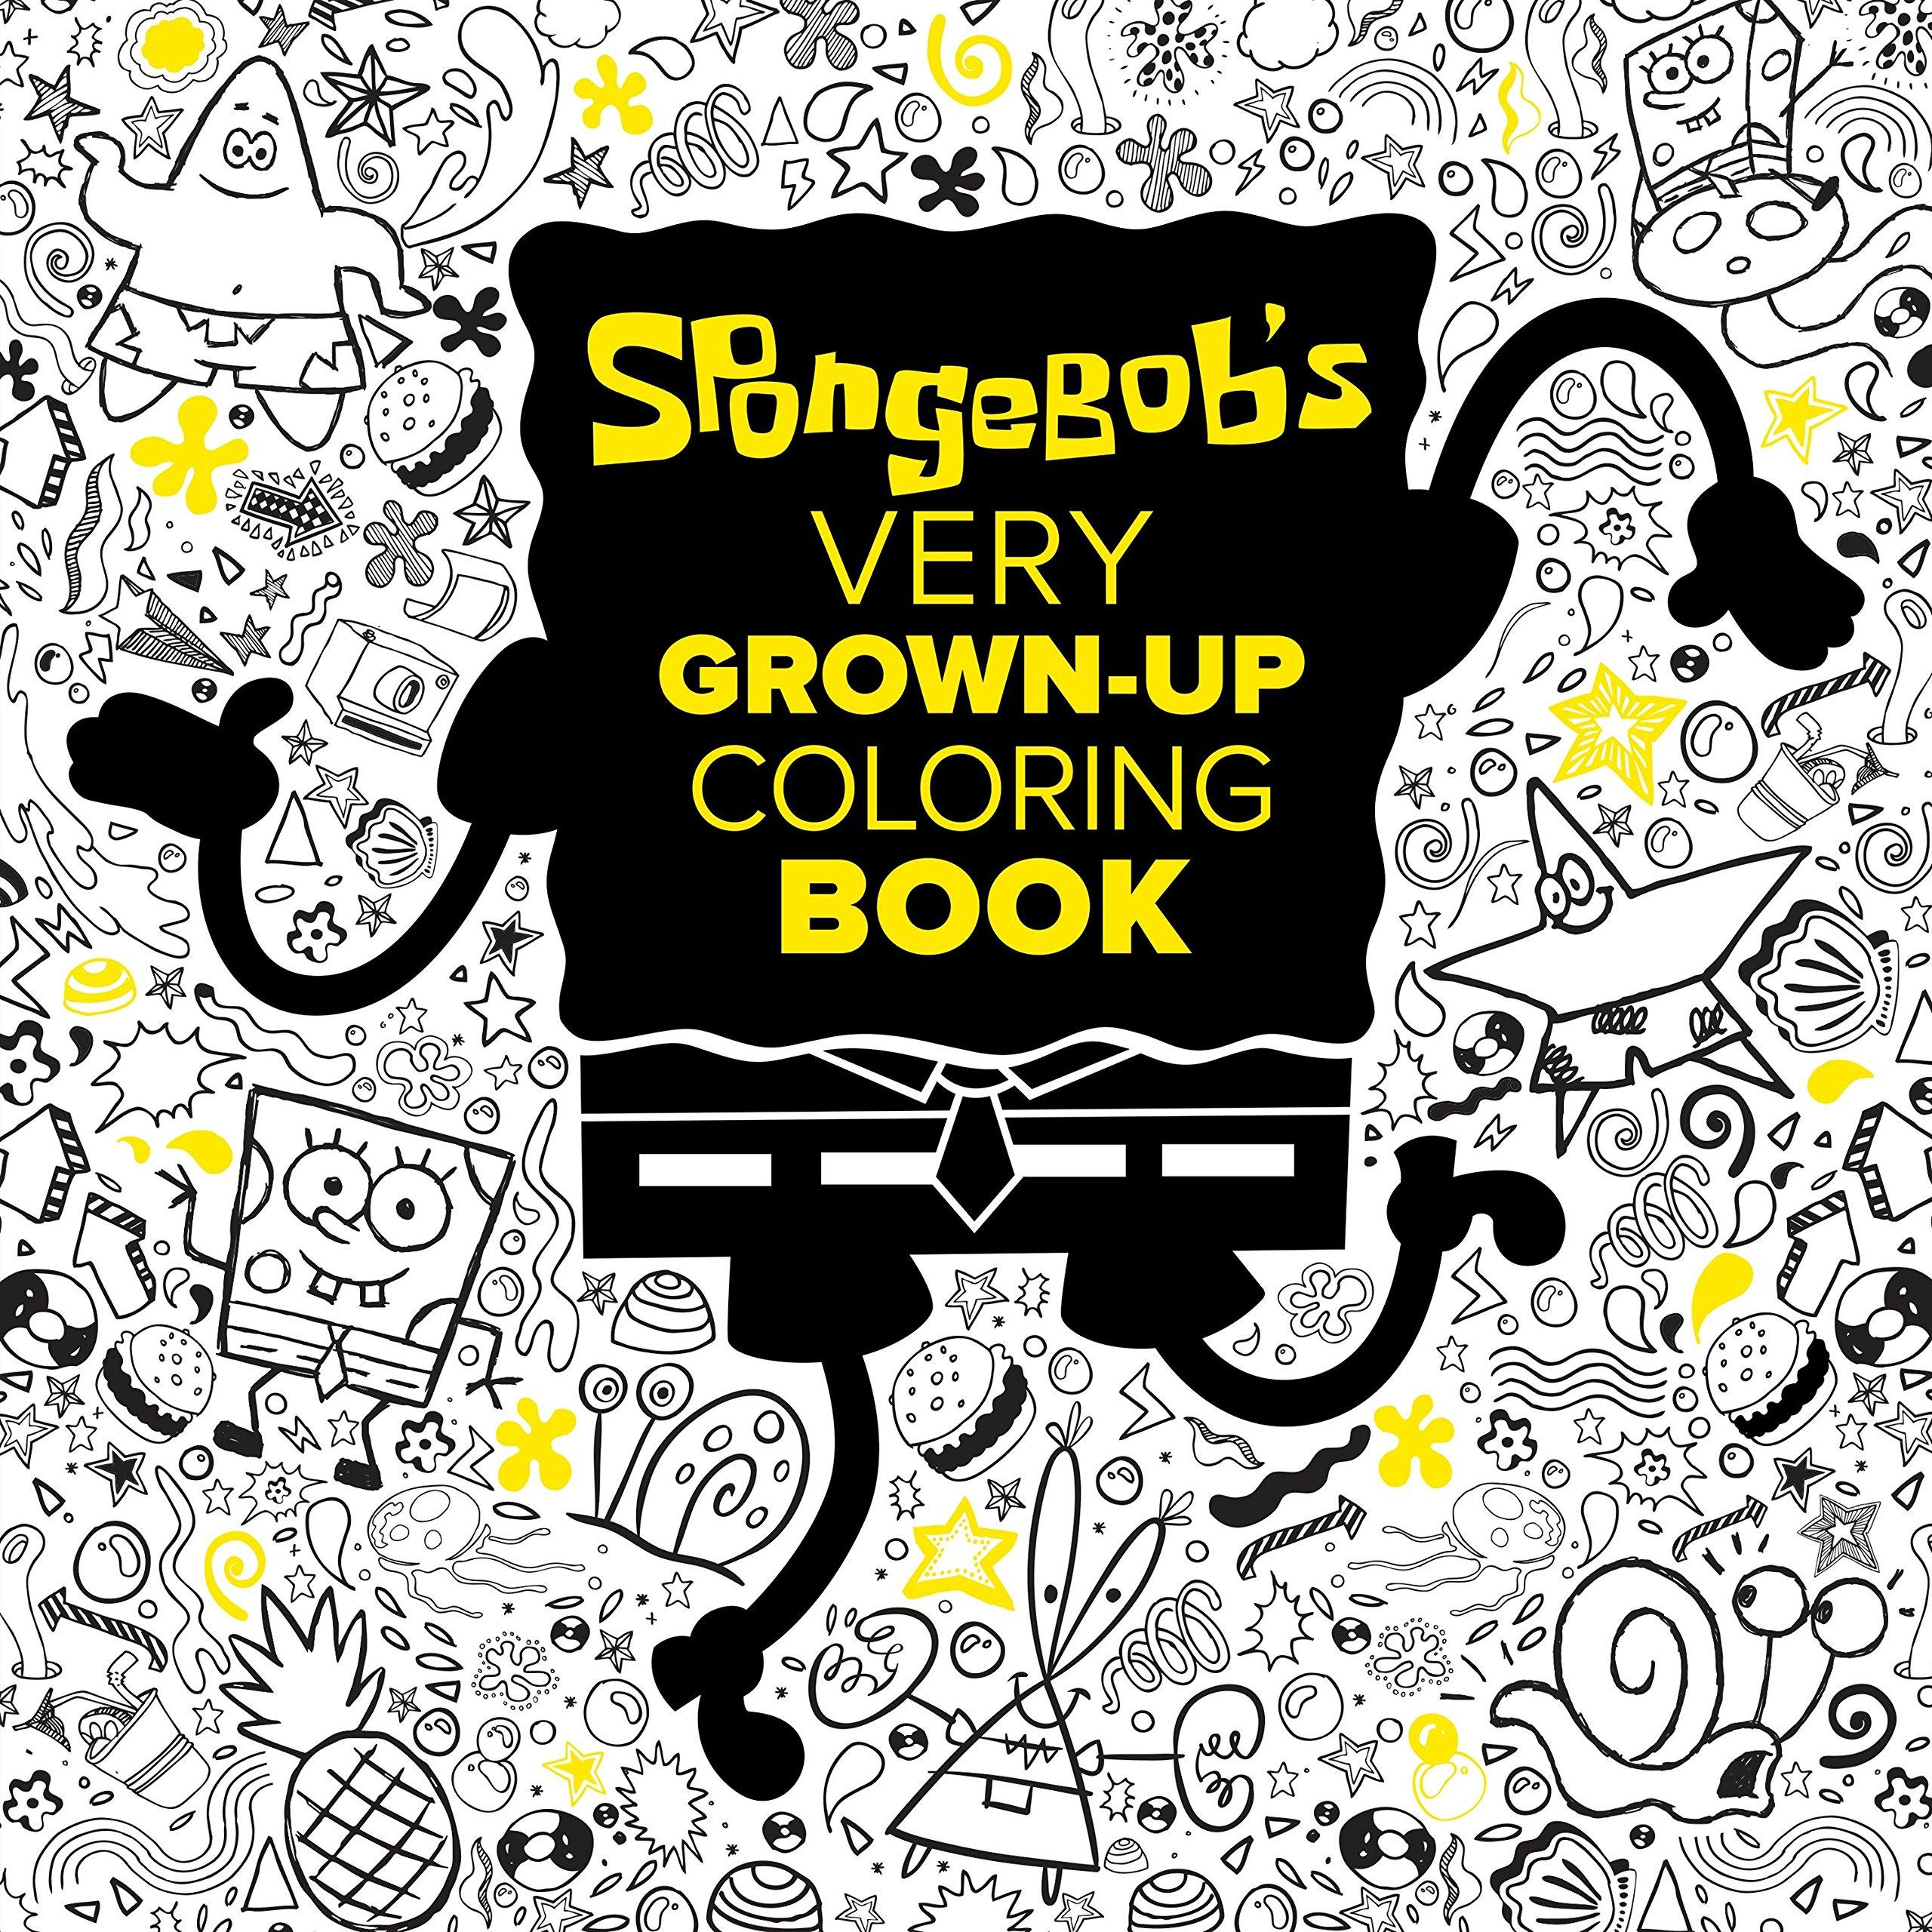 SpongeBob's Very Grown-Up Coloring Book